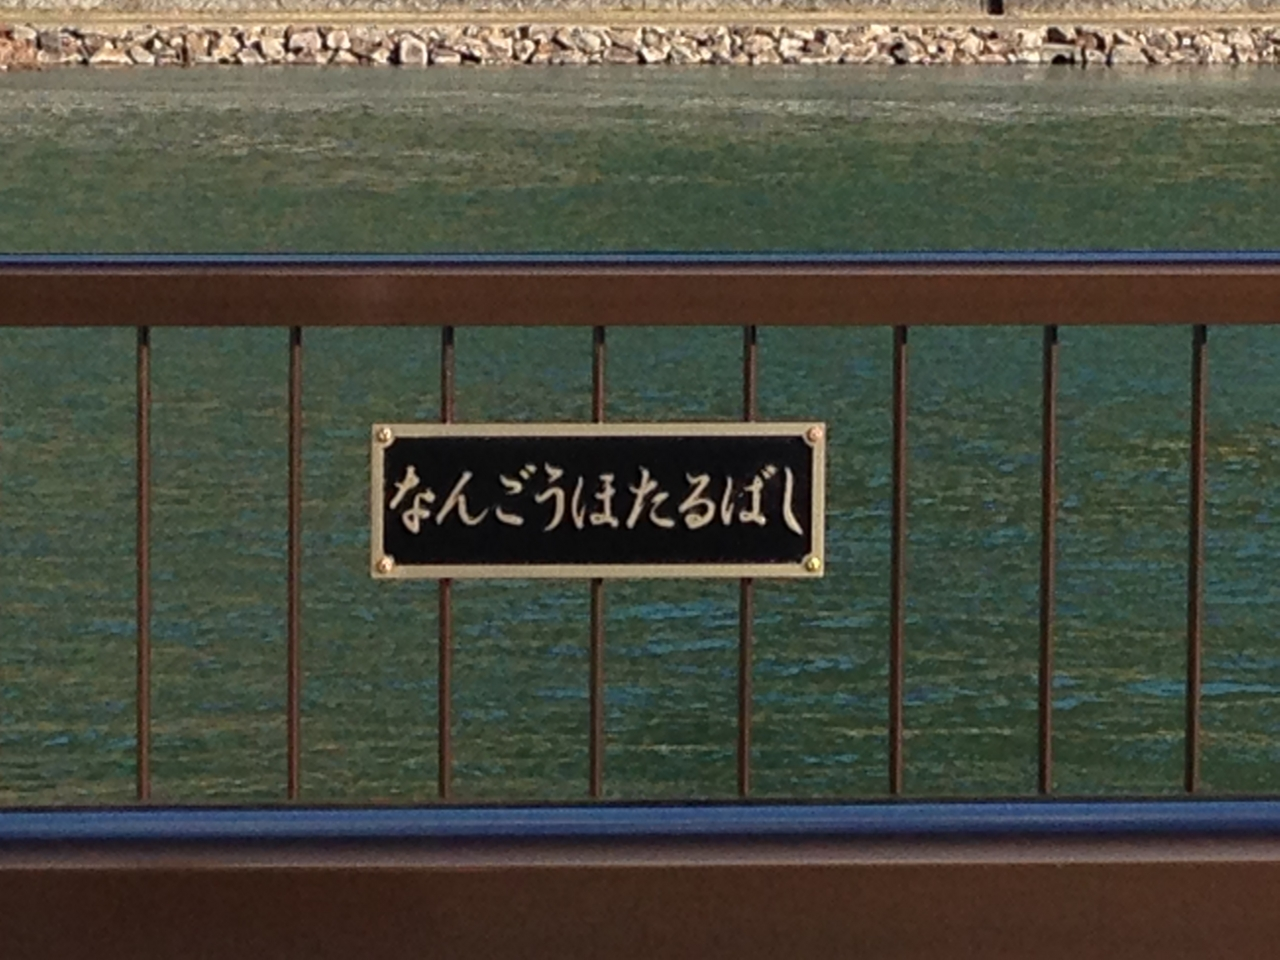 f:id:takatakamanbou:20150124212555j:plain